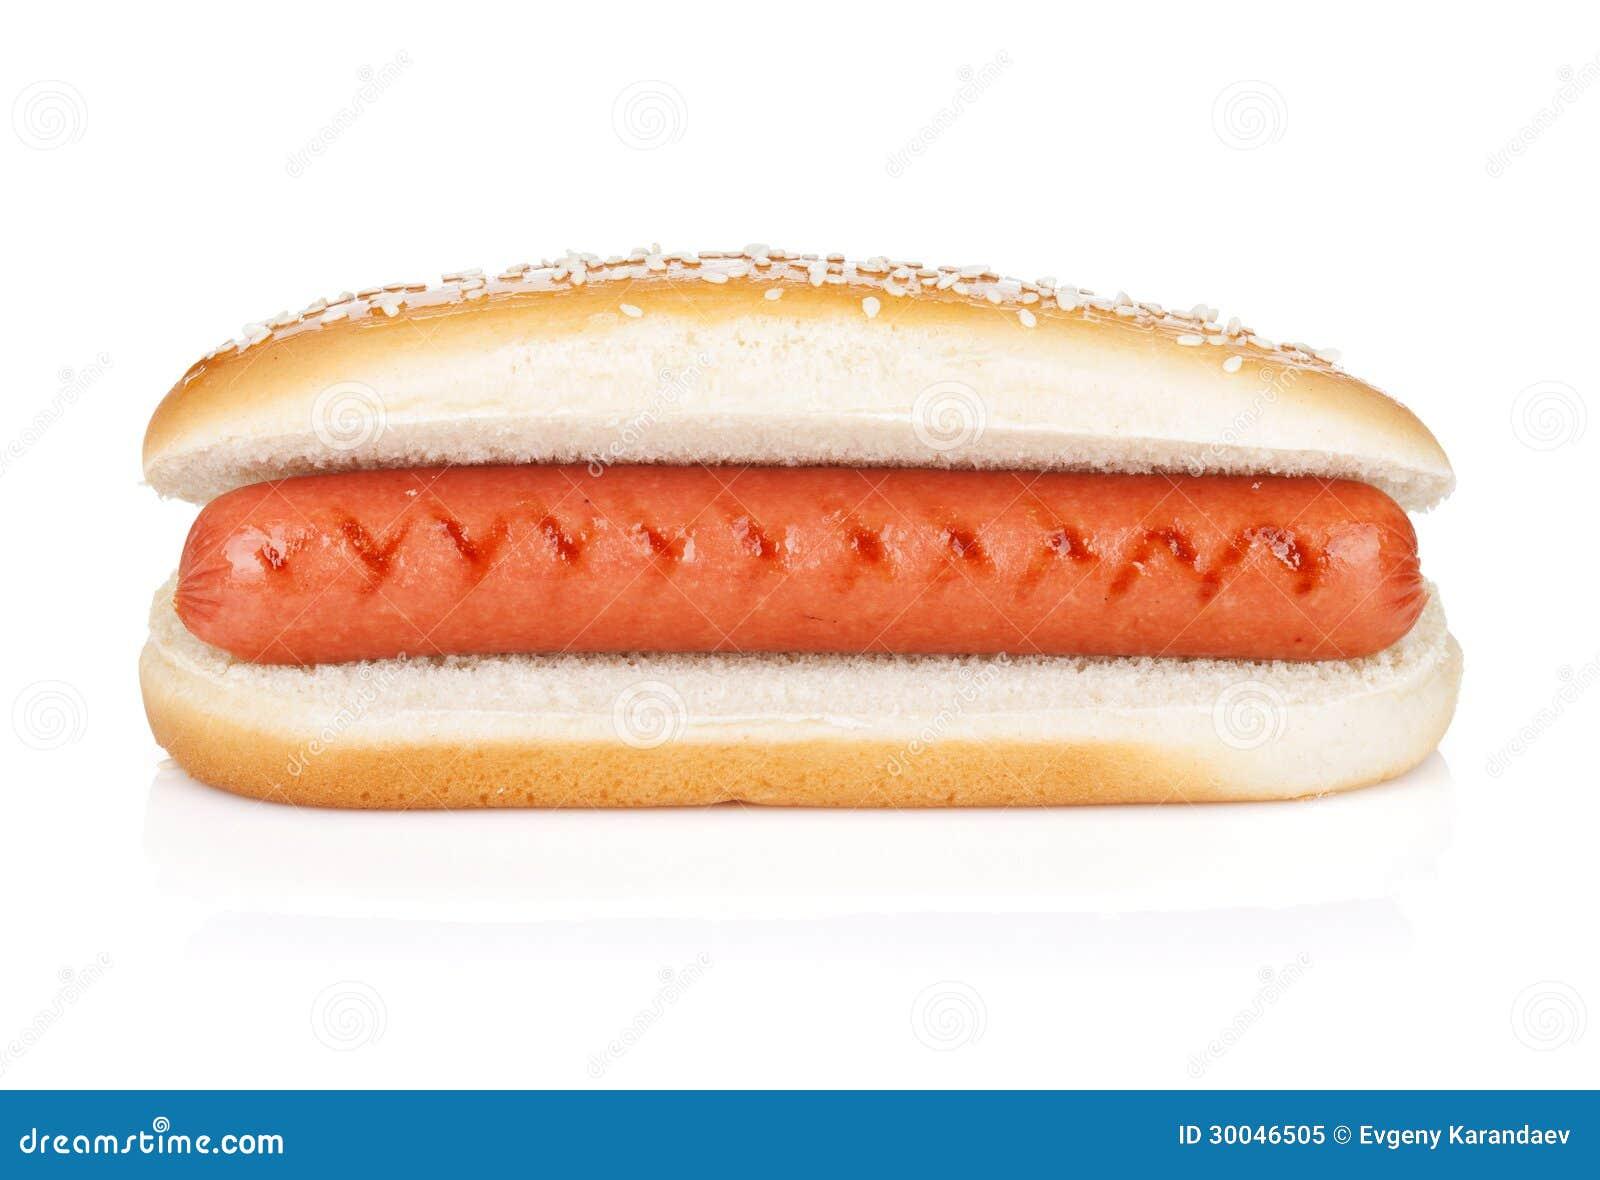 original hot dog royalty free stock photo image 30046505. Black Bedroom Furniture Sets. Home Design Ideas